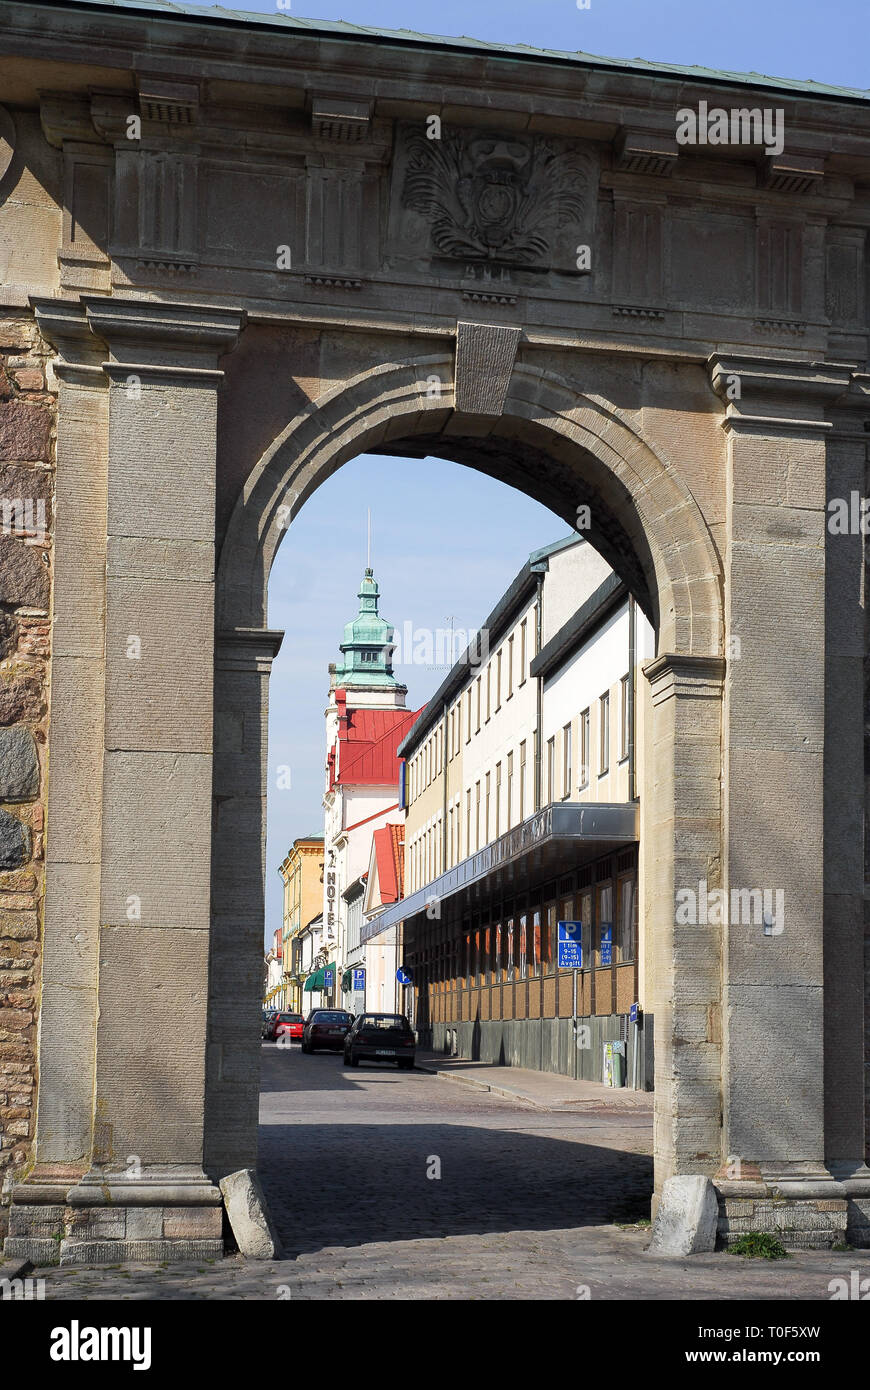 Historic centre of Kalmar, Kalmar County, Sweden. April 11th 2008 © Wojciech Strozyk / Alamy Stock Photo - Stock Image